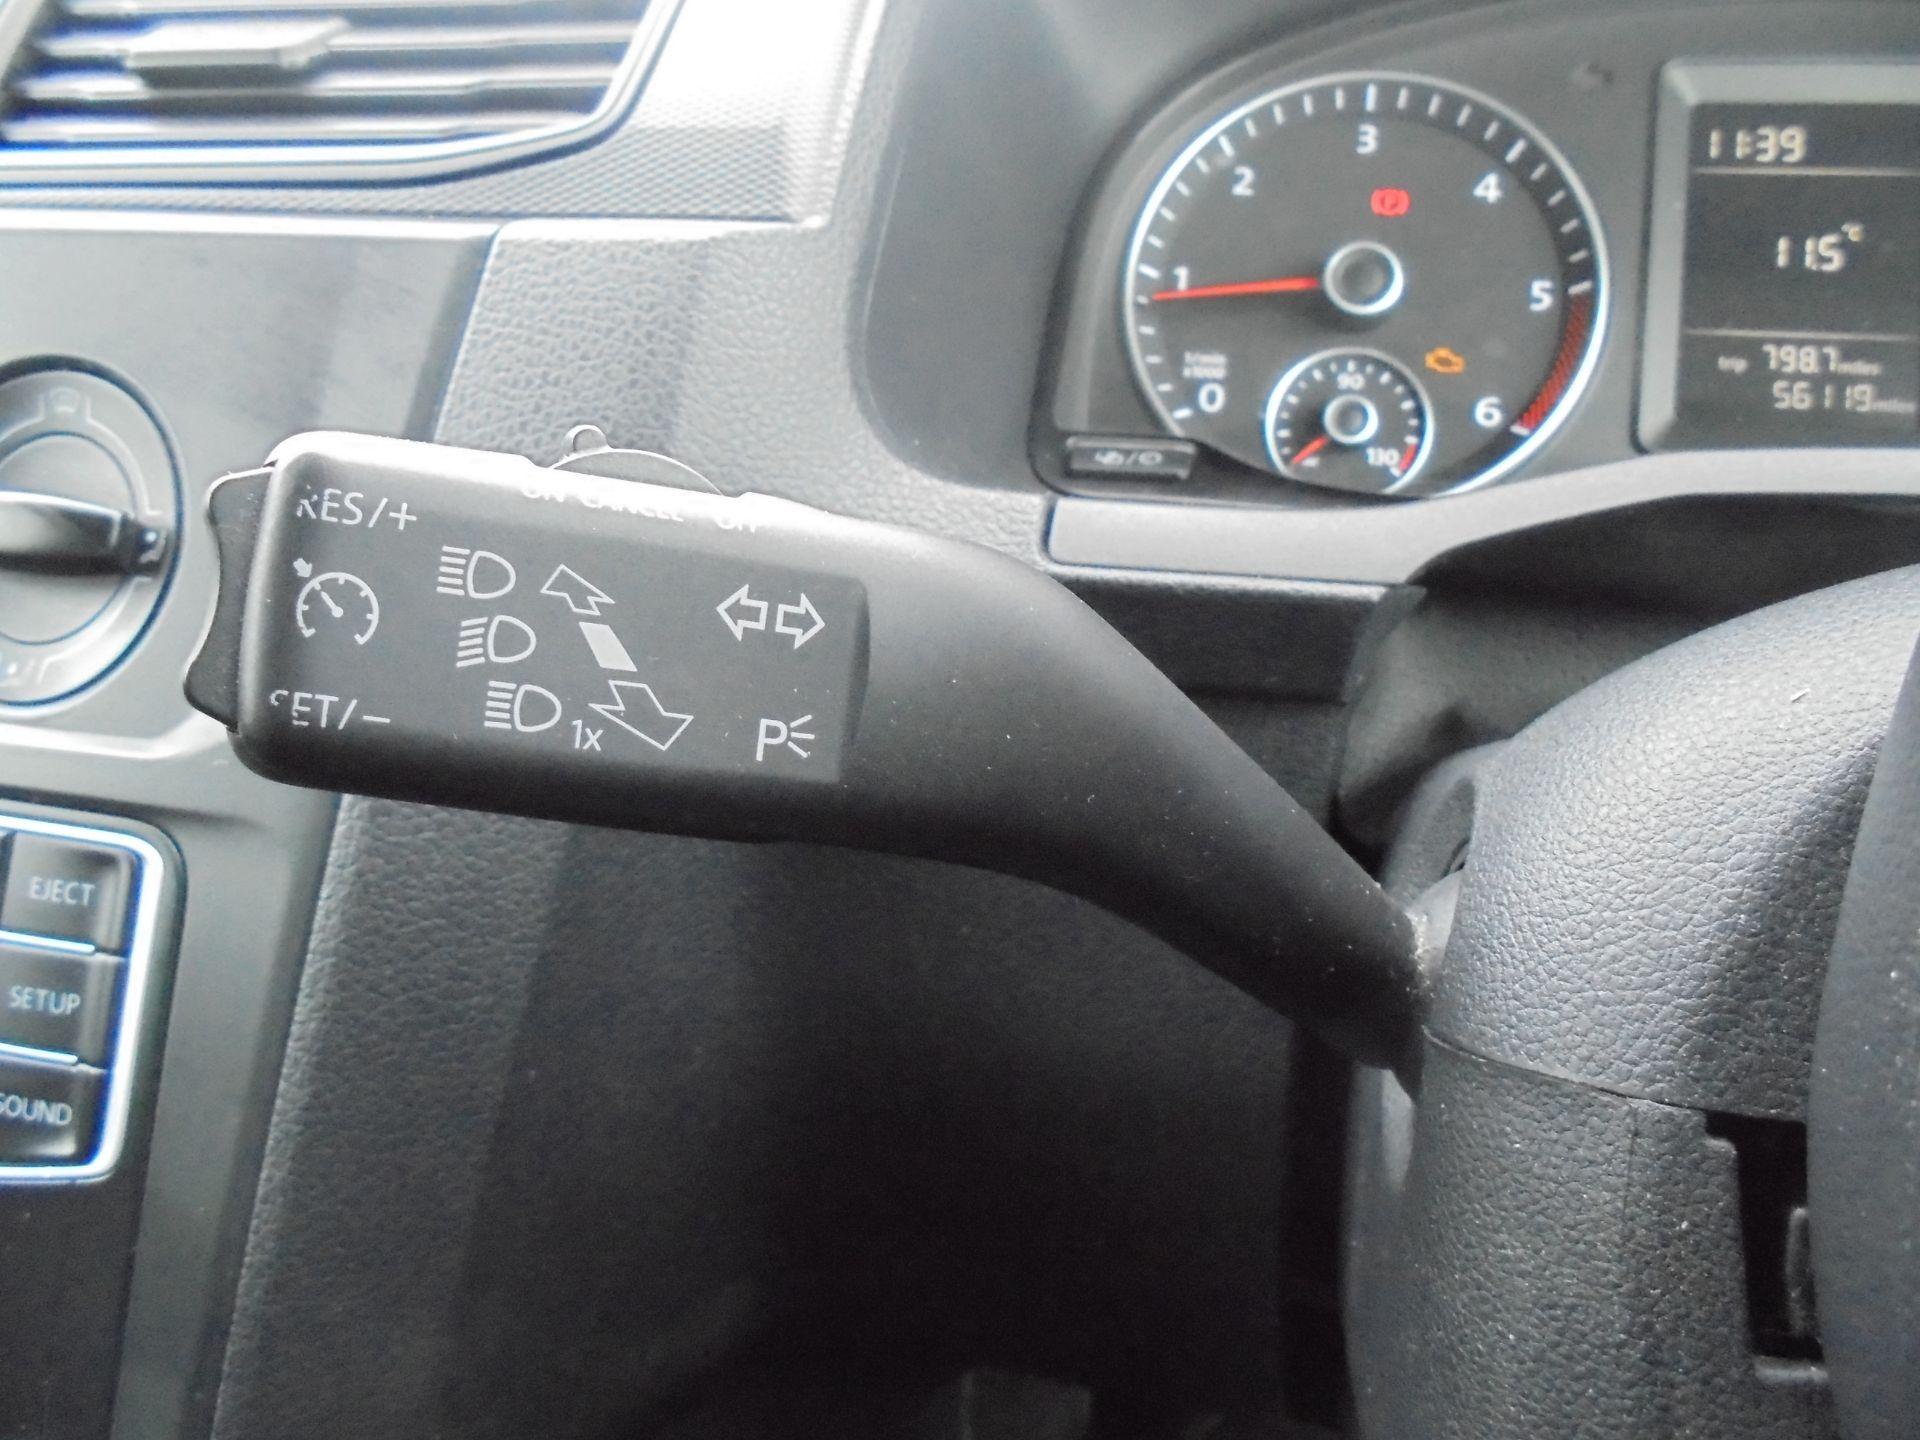 2016 Volkswagen Caddy 1.6 TDI BLUEMOTION TECH 75PS EURO 5 (GF66BZK) Image 19